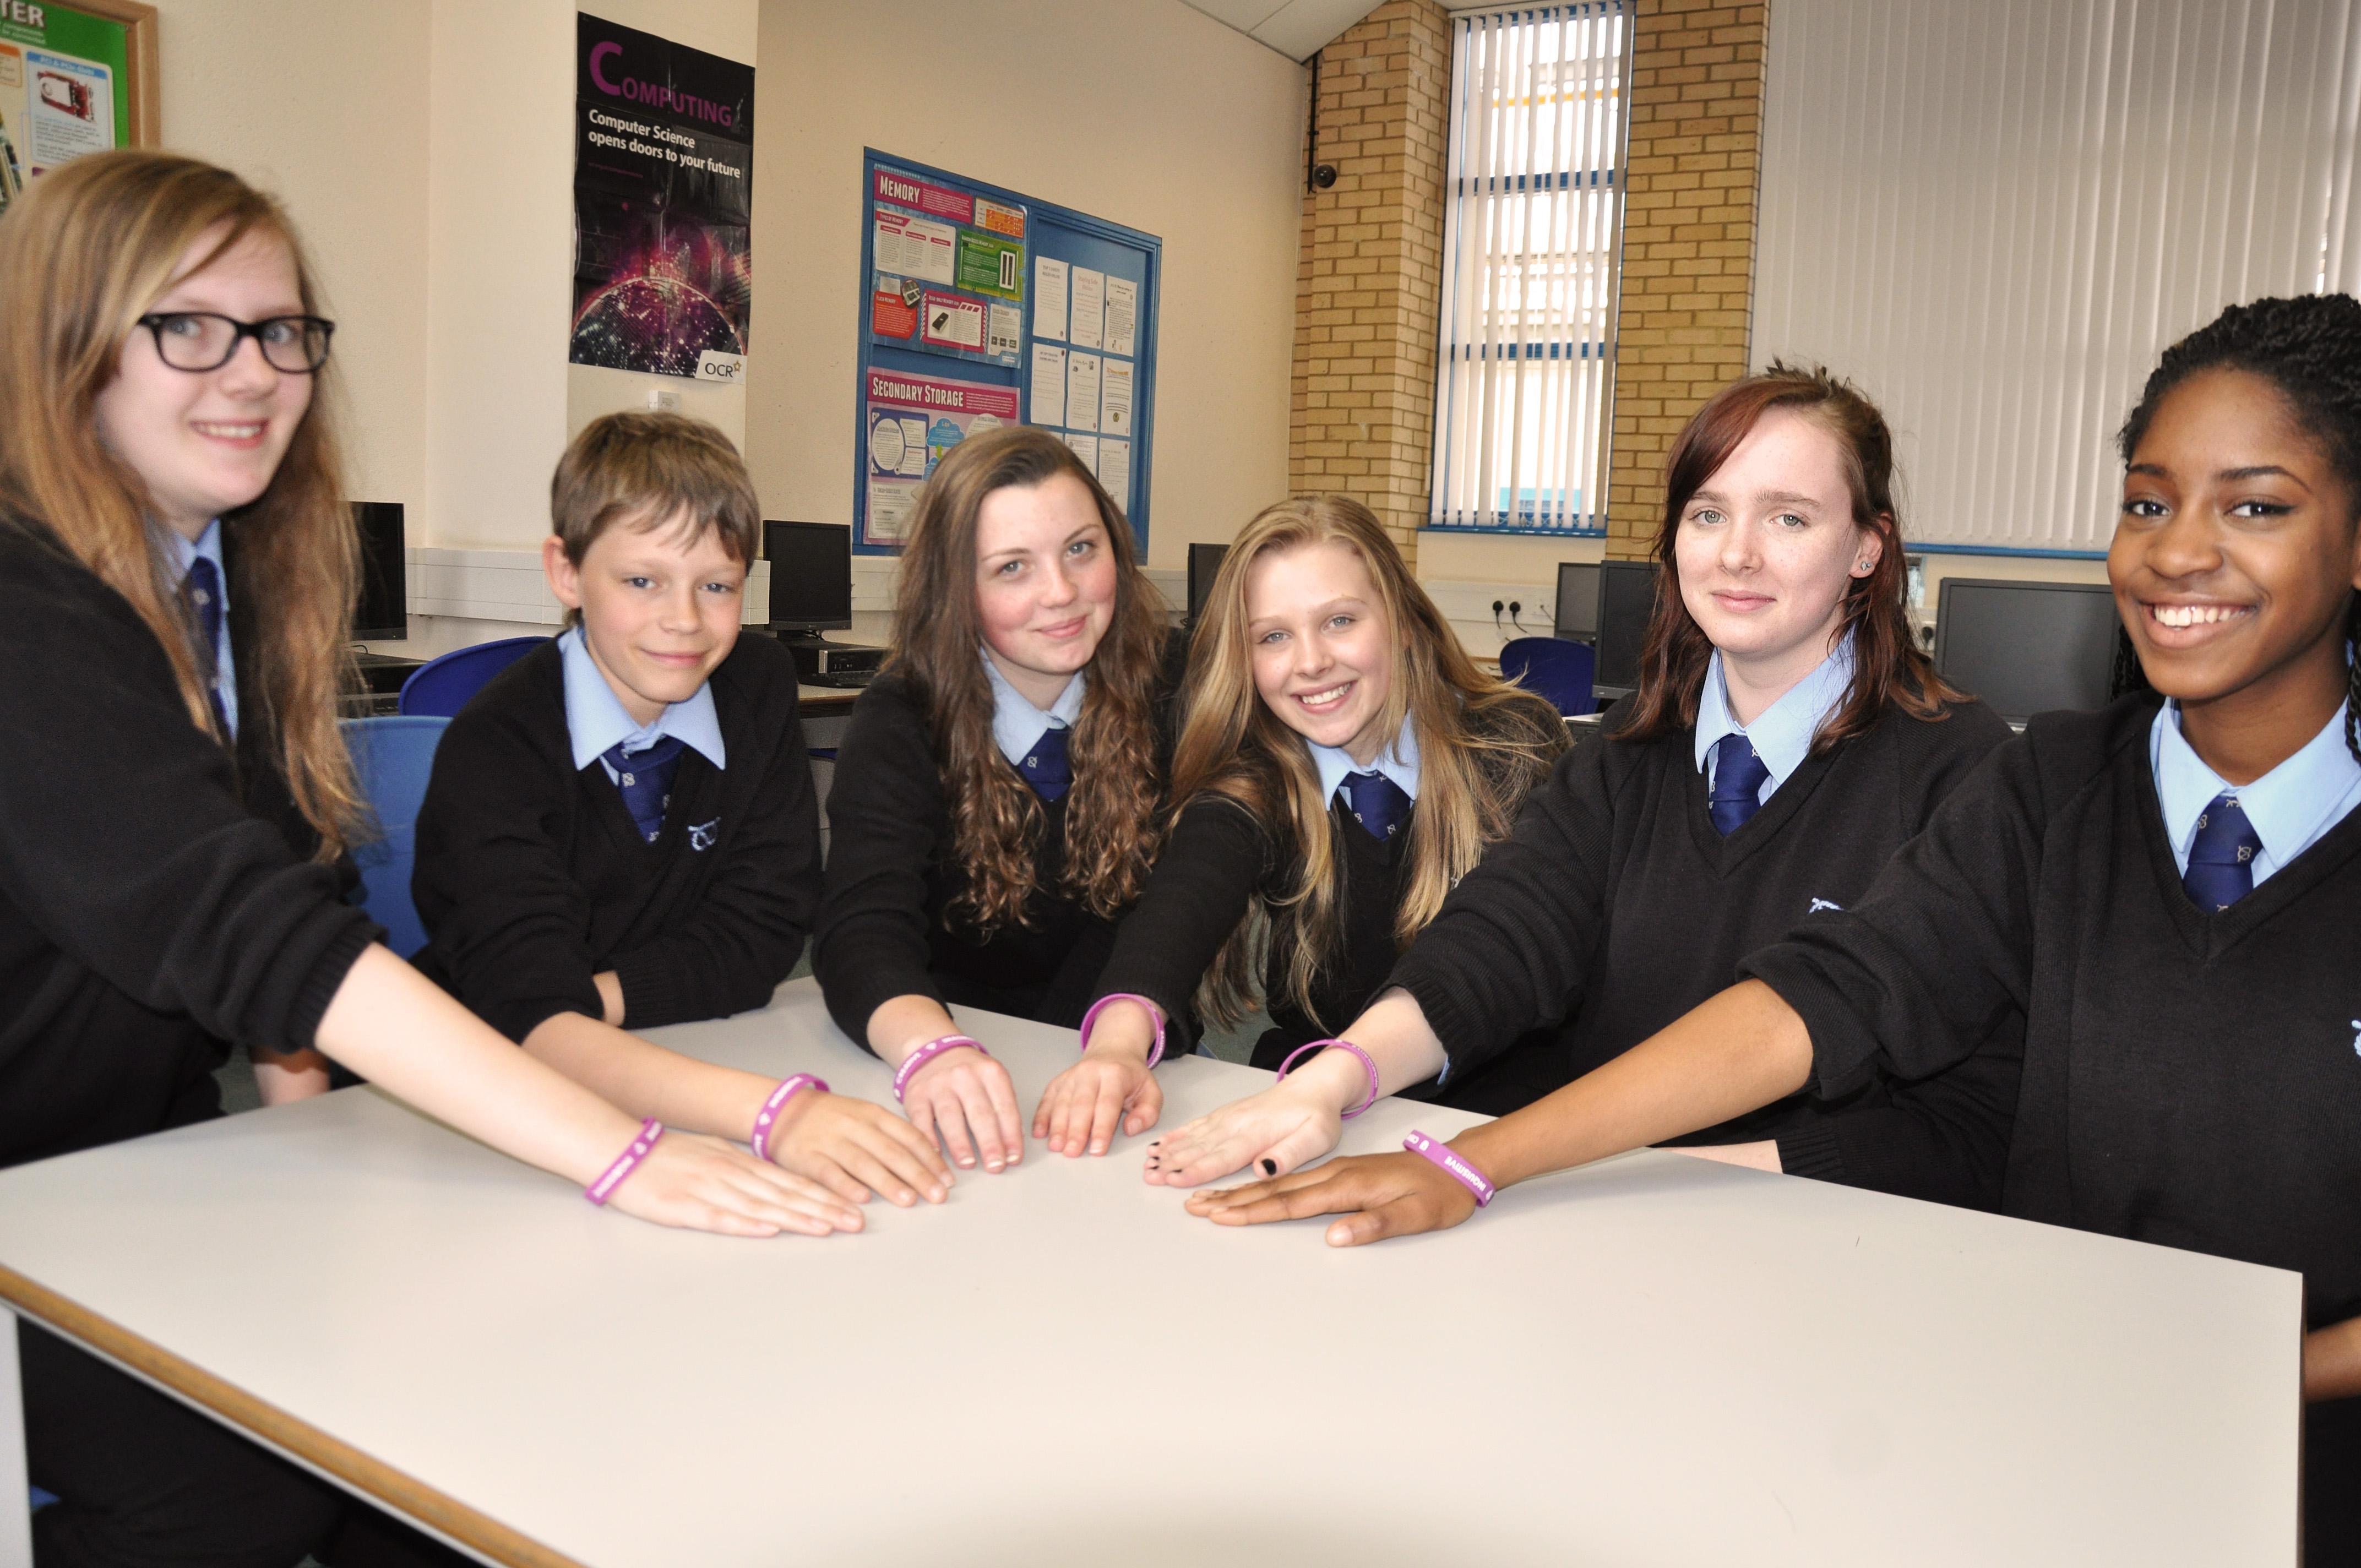 denbigh school design team